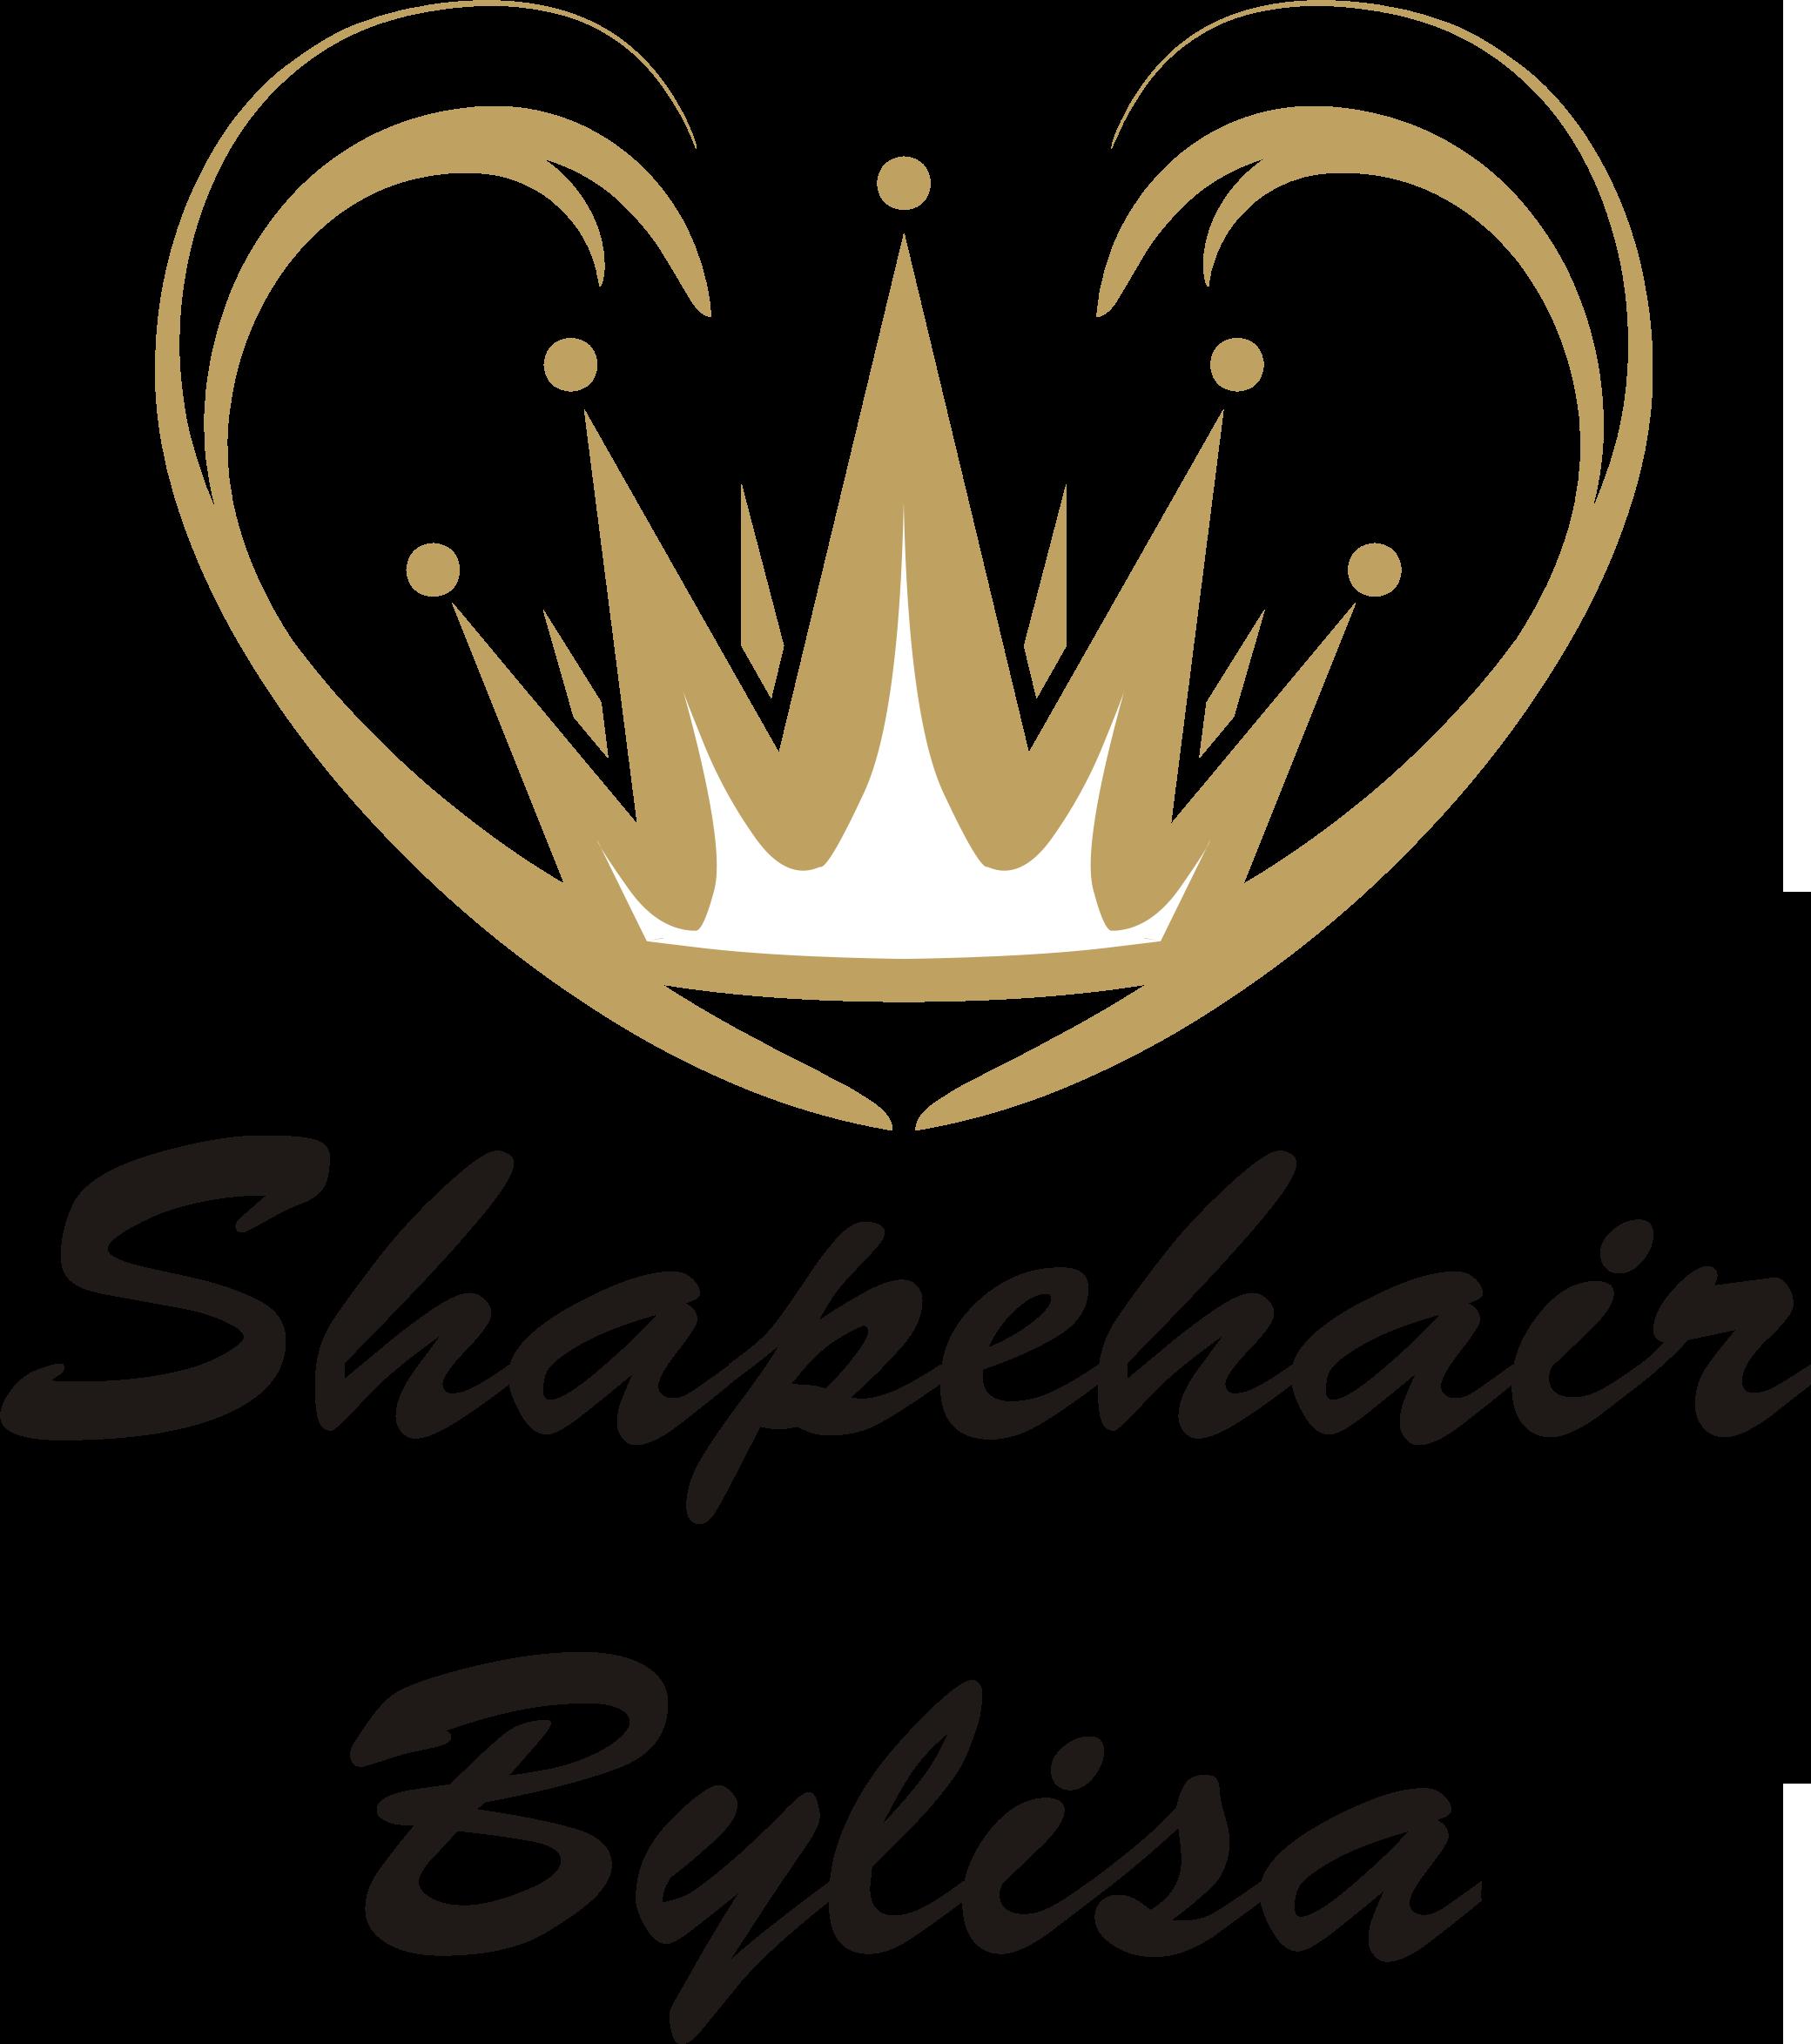 Shapehair bylisa logo goud zwart